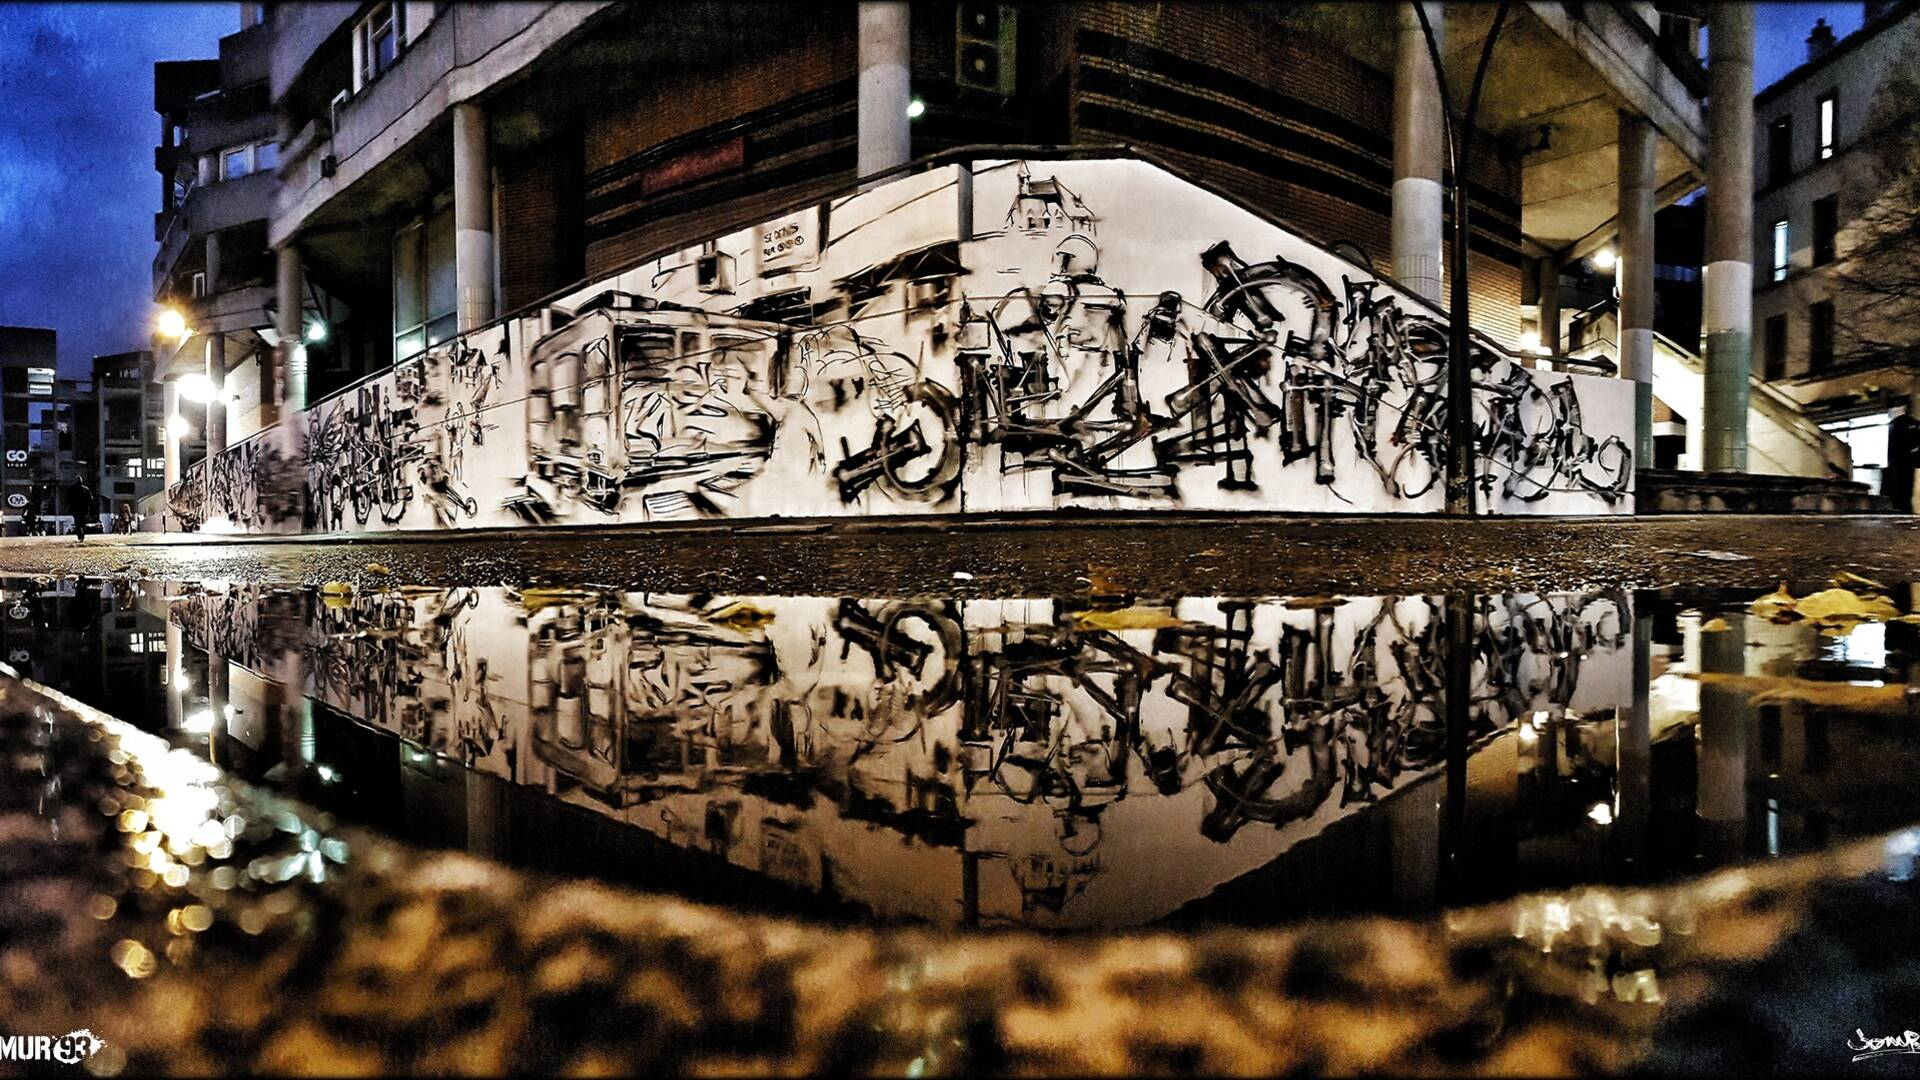 black-lines-art-urbain-street-art-93-seine-saint-denis-mur-93